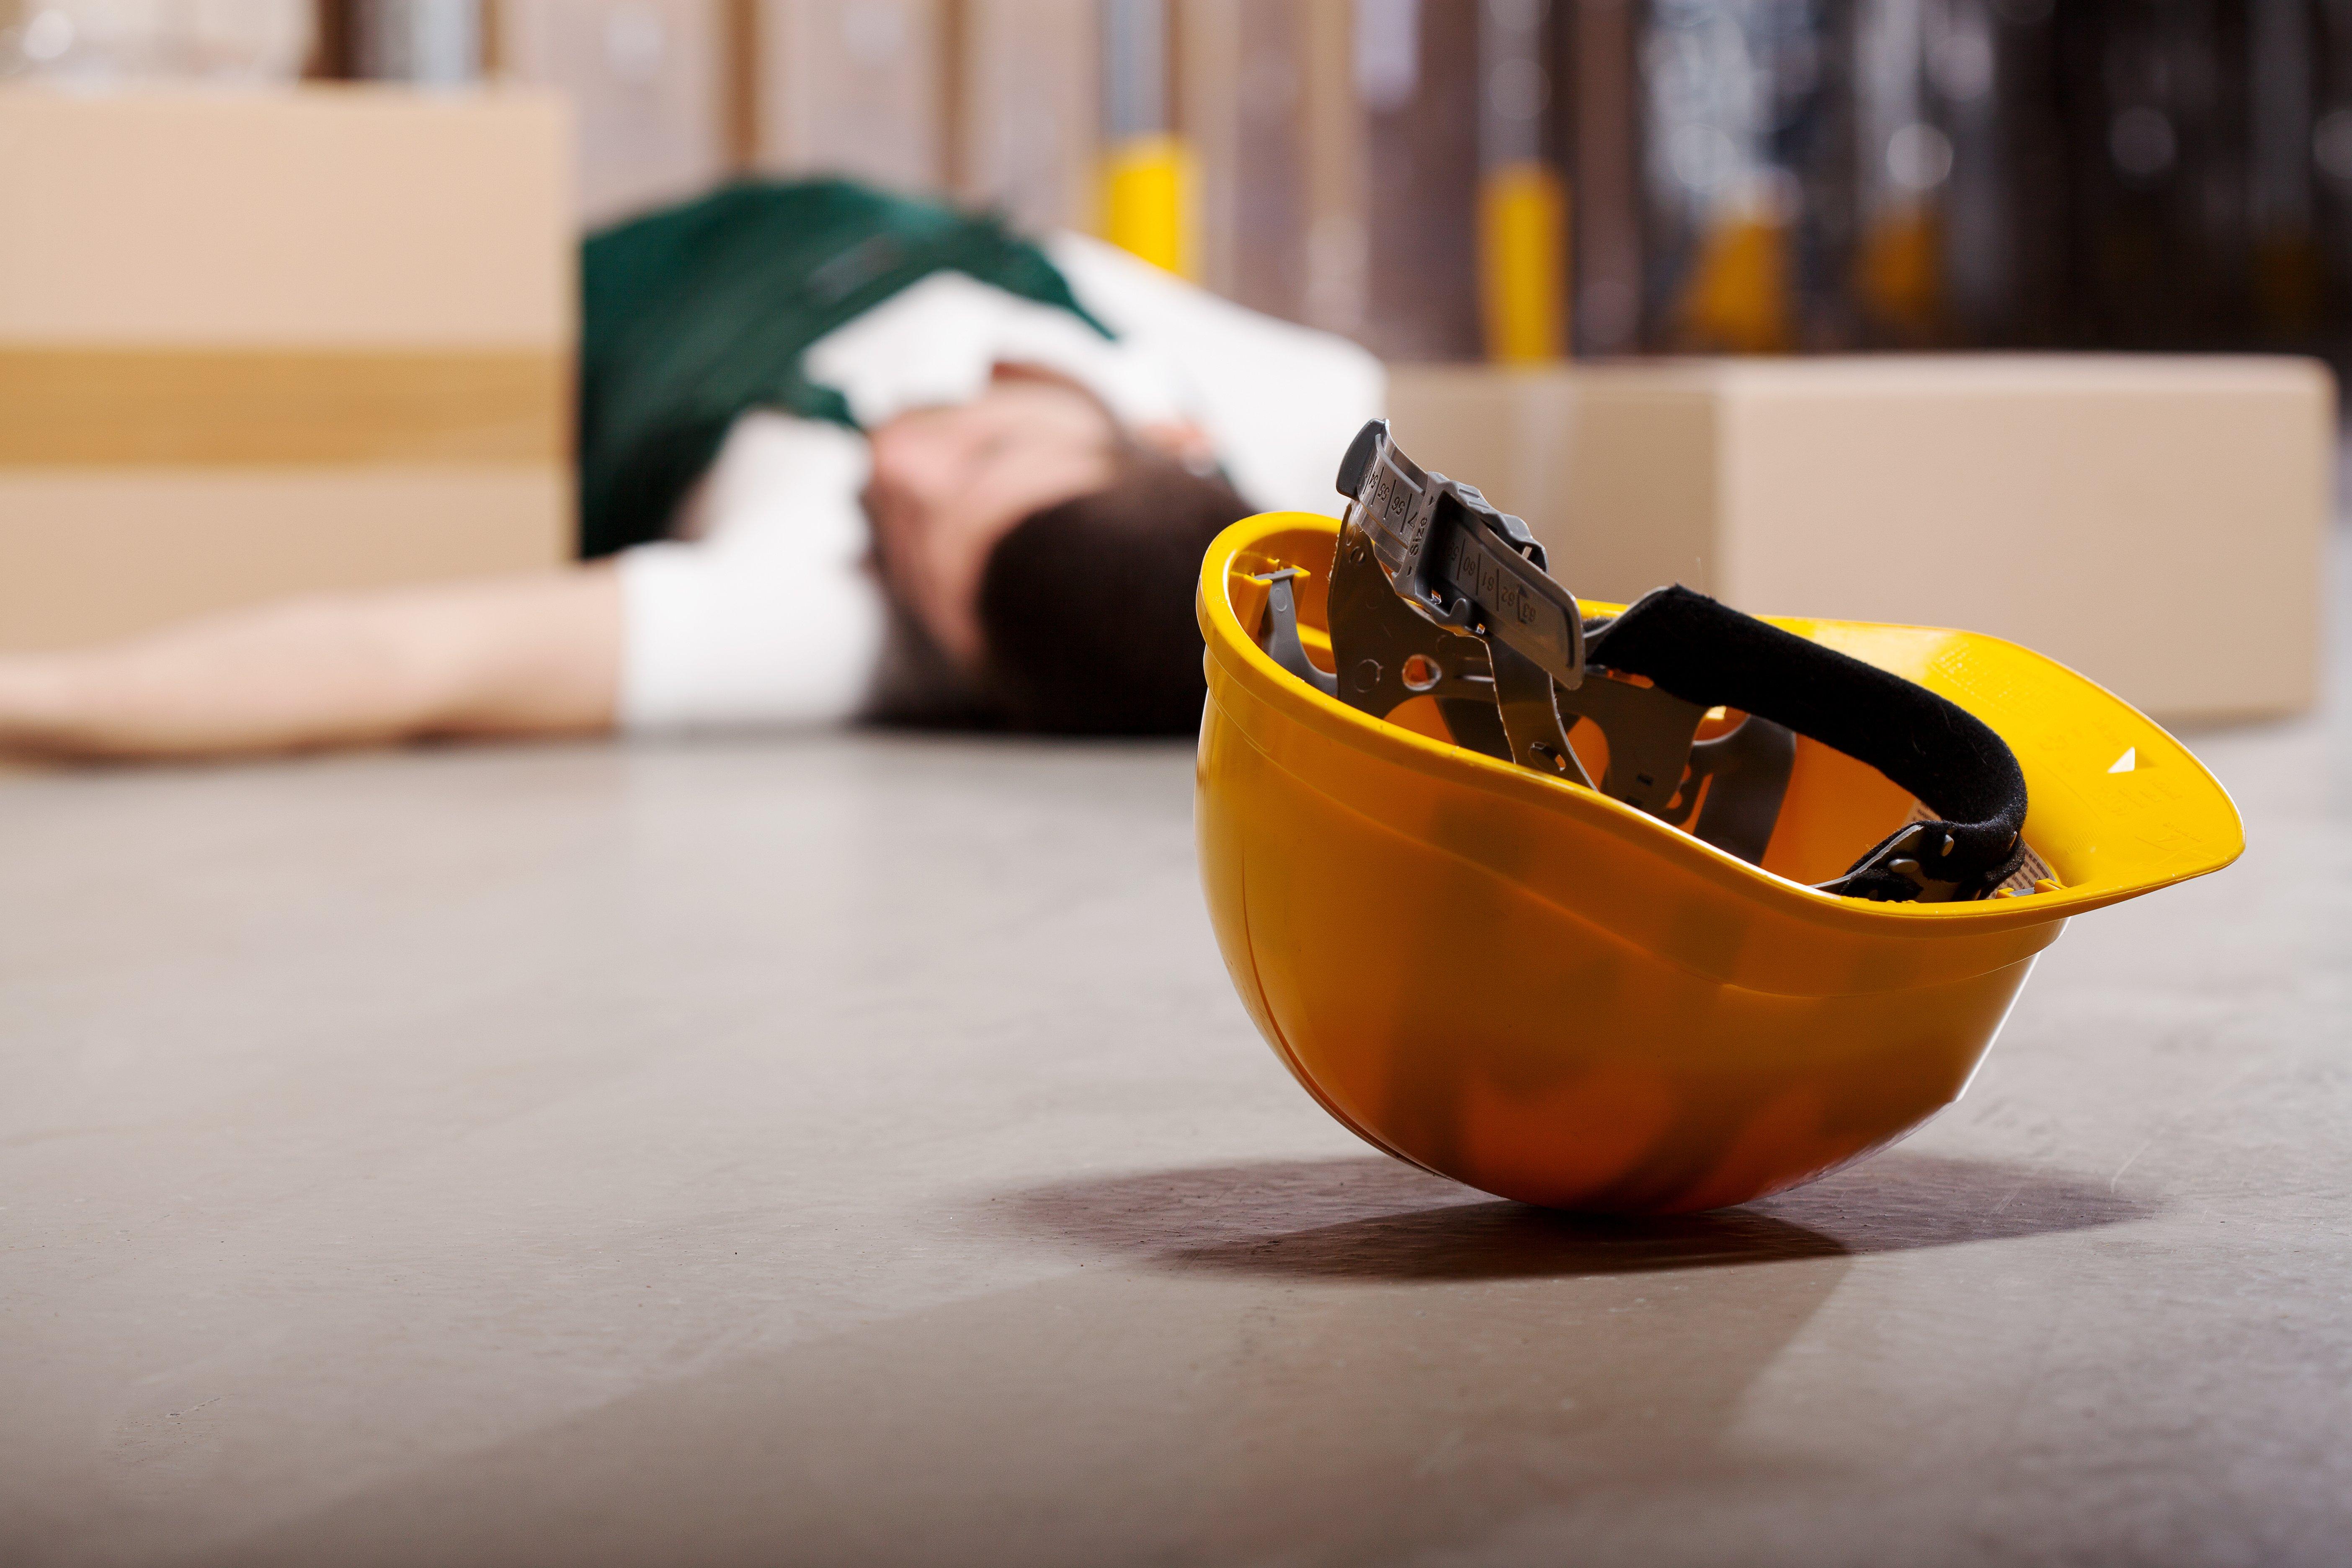 An injured worker lies on the ground